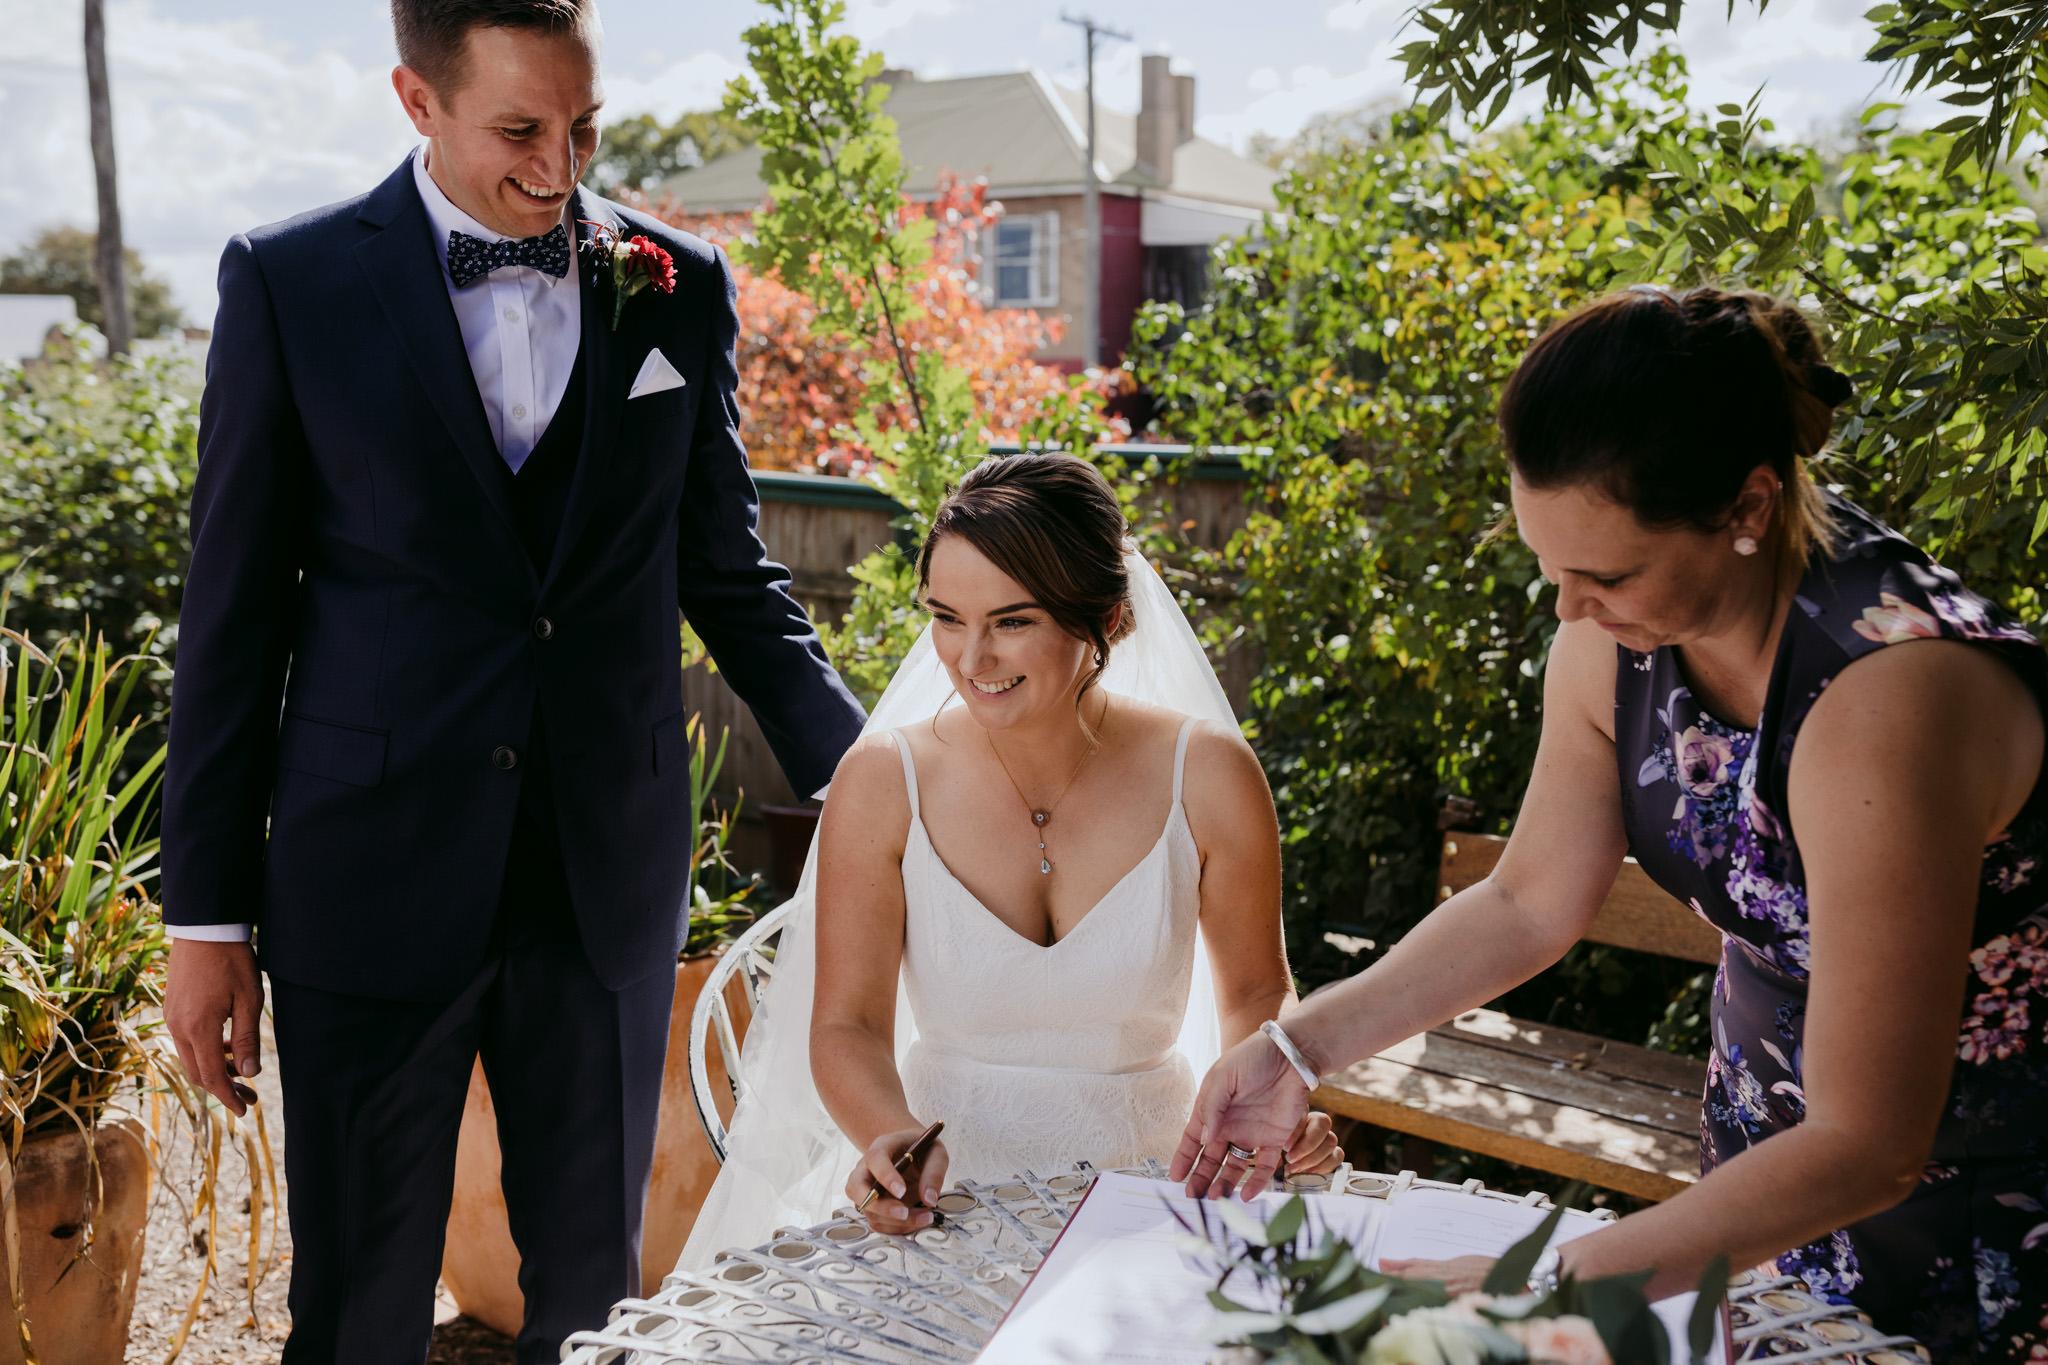 Erin Latimore Mudgee Canberra Wedding Photographer ROSEBANK GUESTHOUSE OLD THEATRE TONIC MILLTHORPE_269.JPG